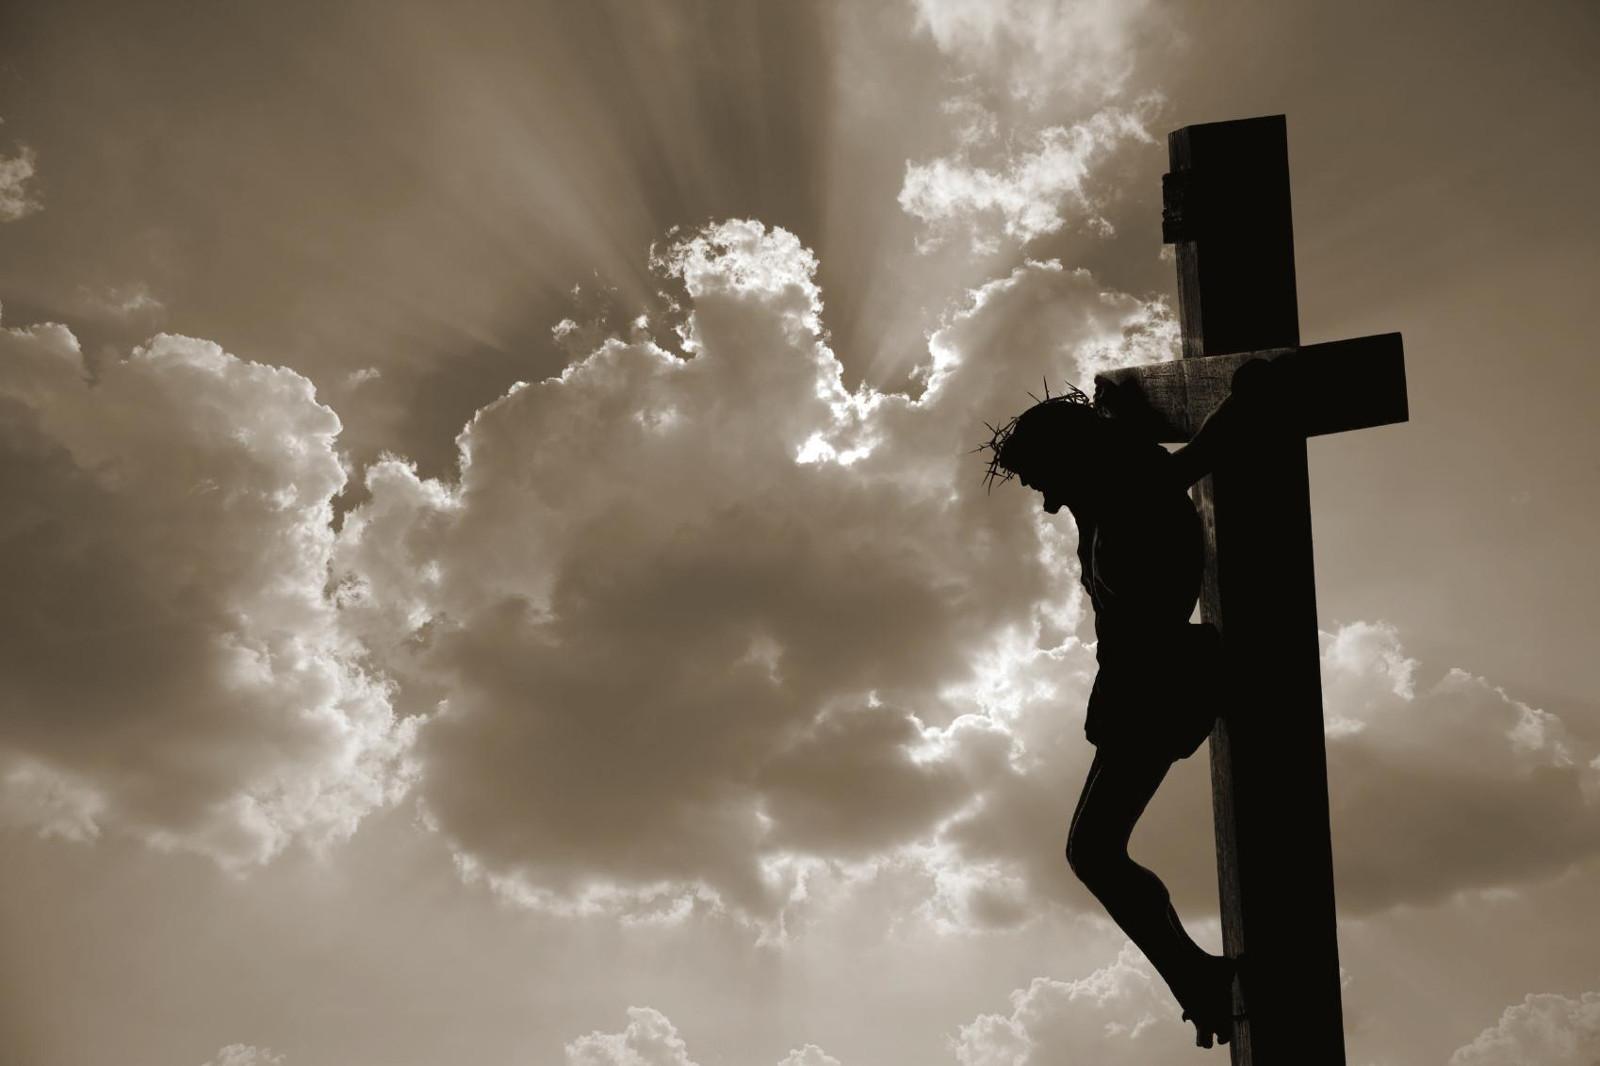 Resource Highlight: Jesus' Death and Resurrection